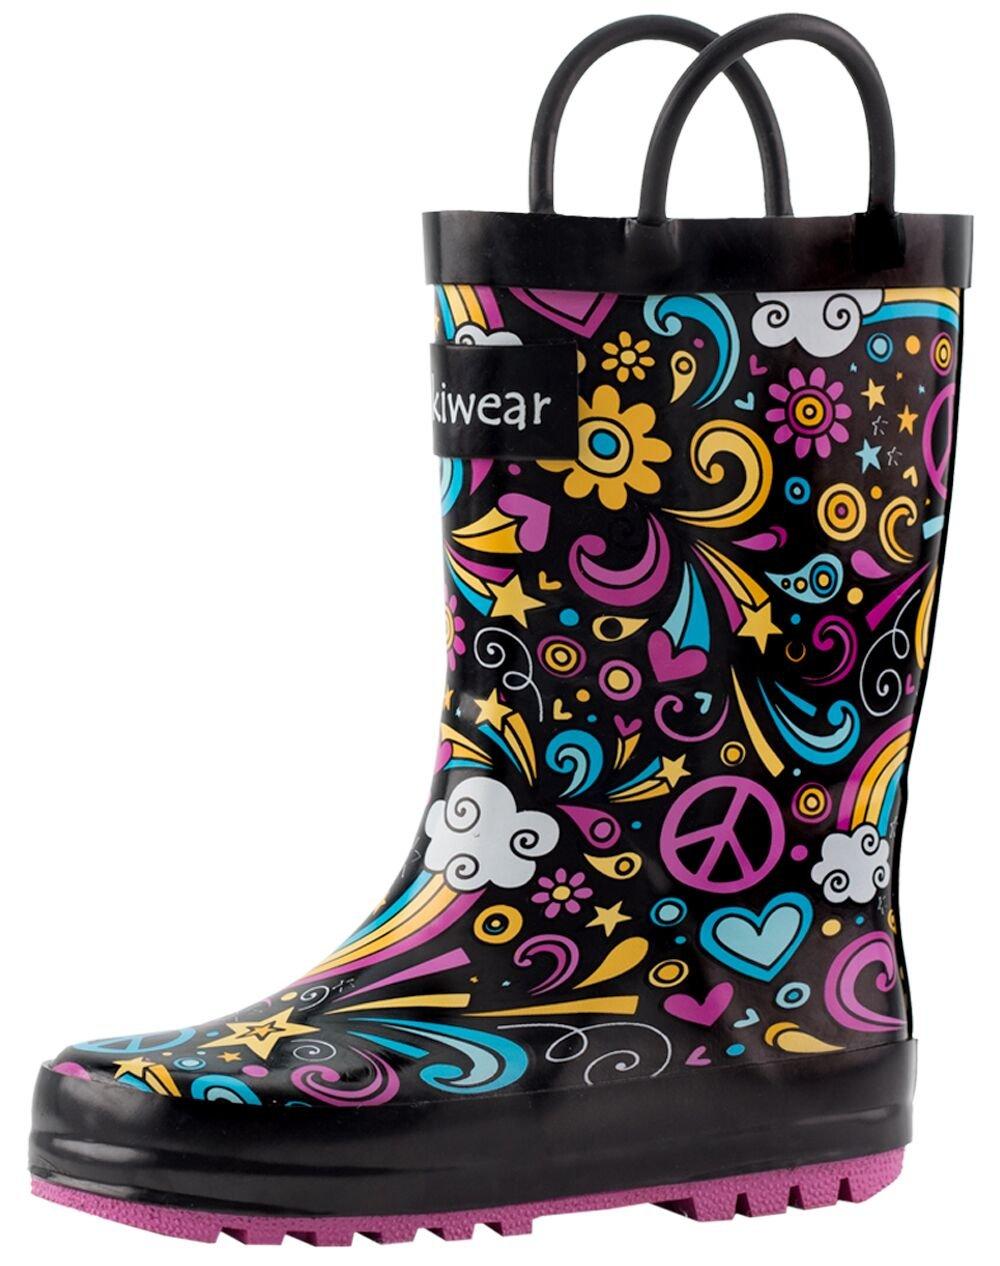 Oakiwear Kids Rubber Rain Boots with Easy-On Handles, Peace, Love & Rainbows, 11T US Toddler, Peace by Oakiwear (Image #3)